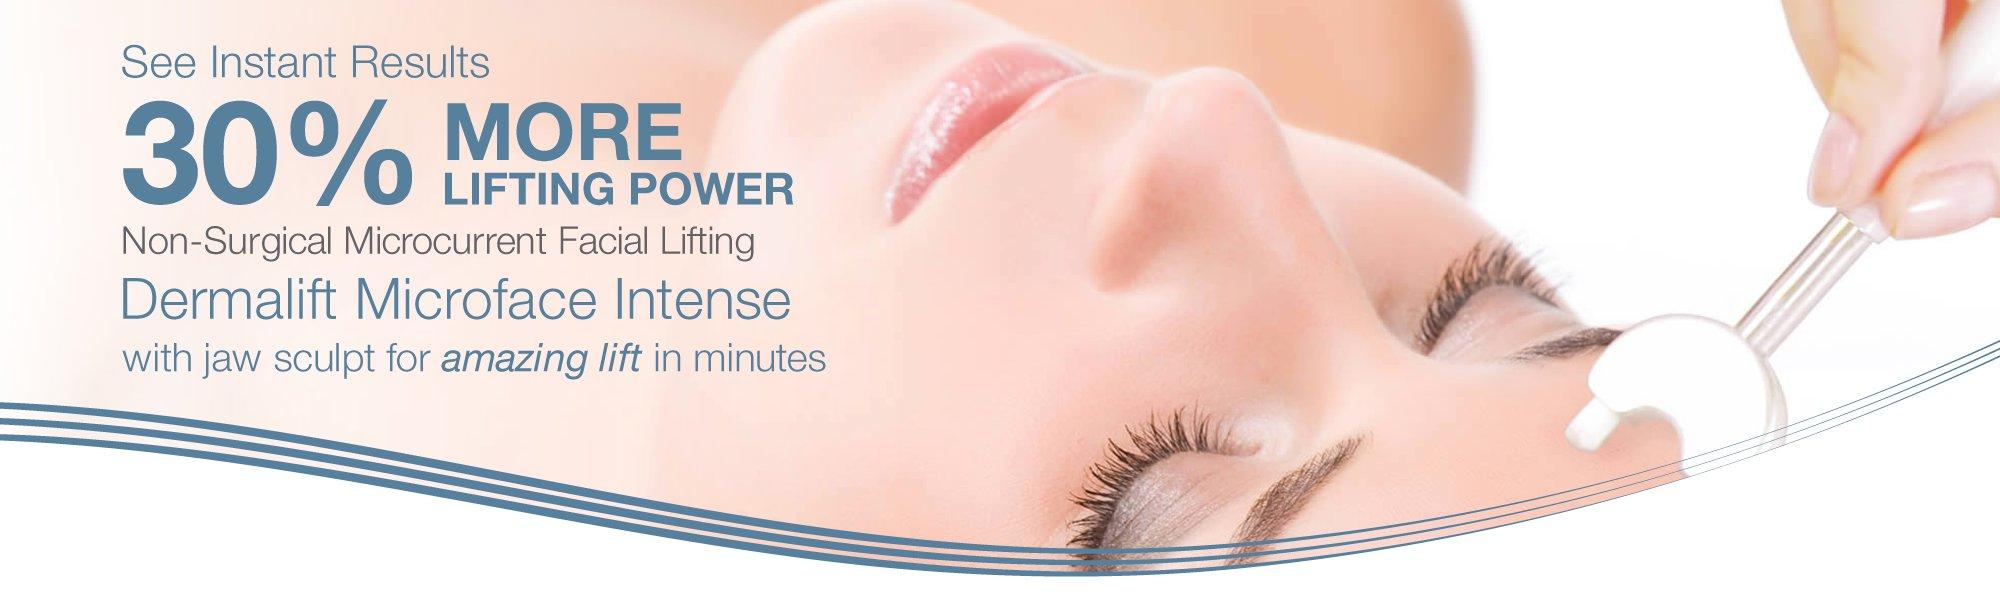 Microface Intense Face Lifting